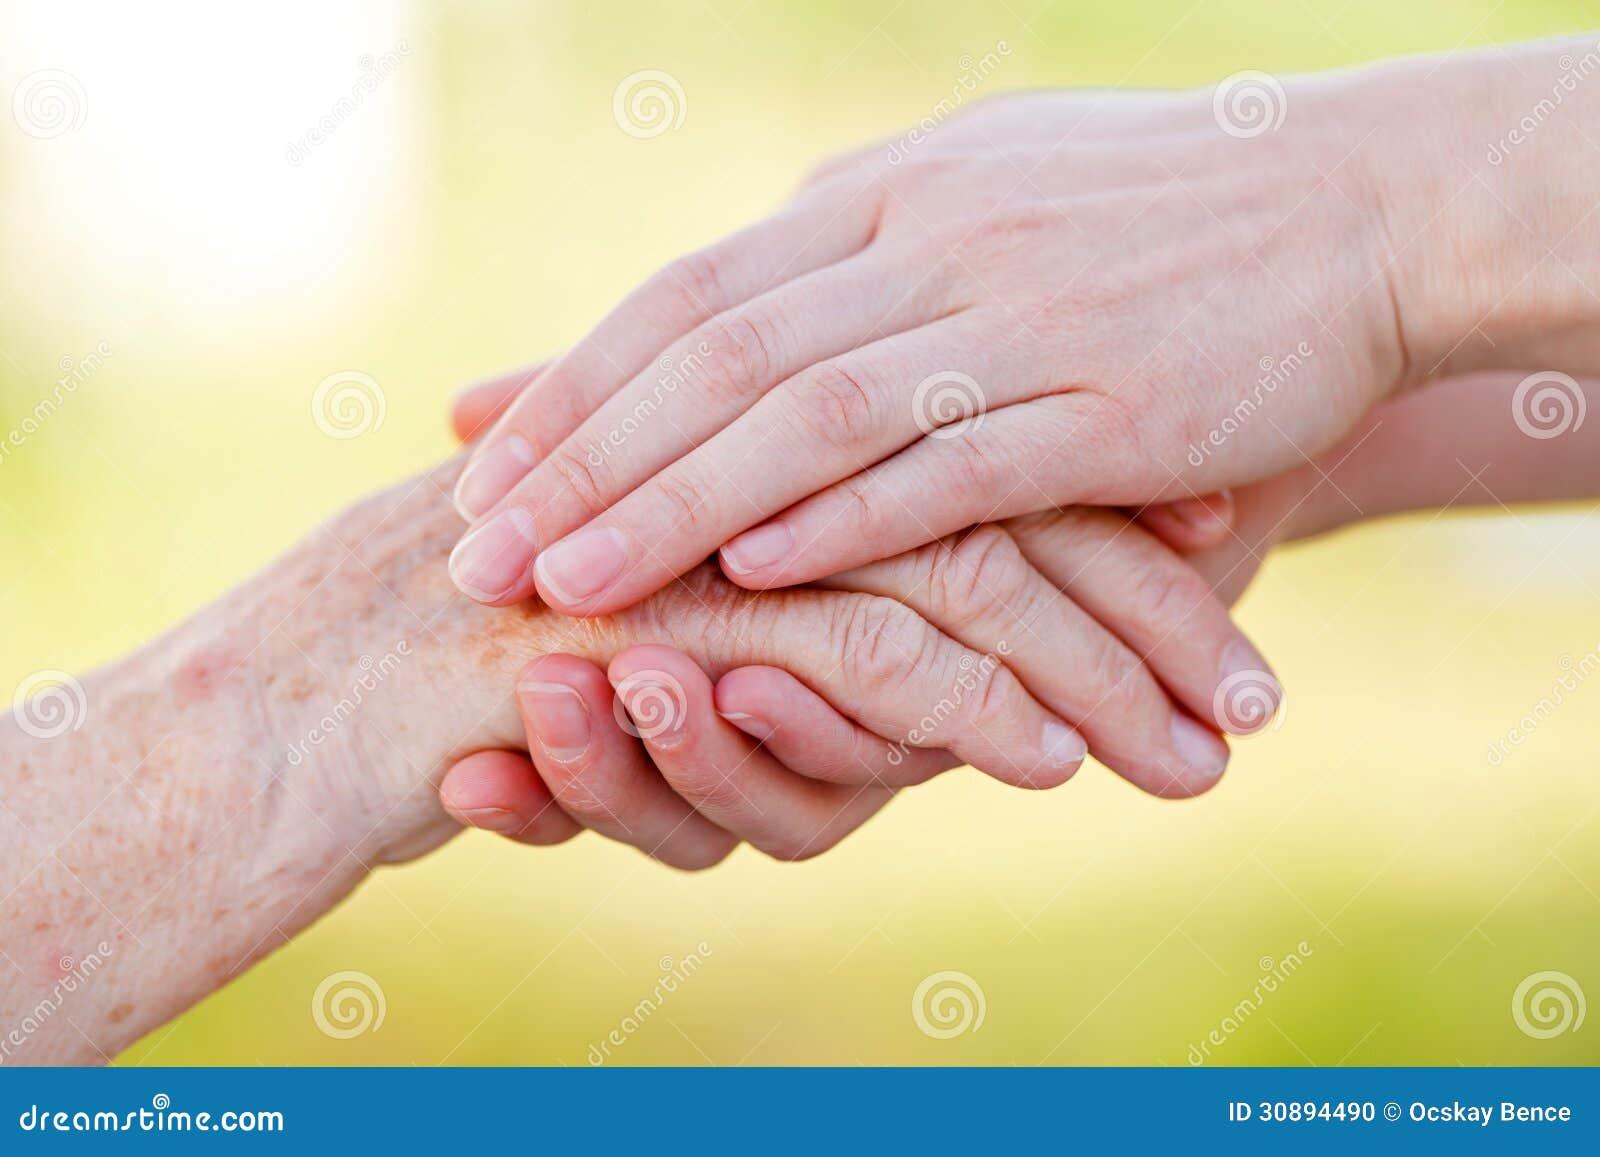 Senior Homecare Stock Photo Image 30894490